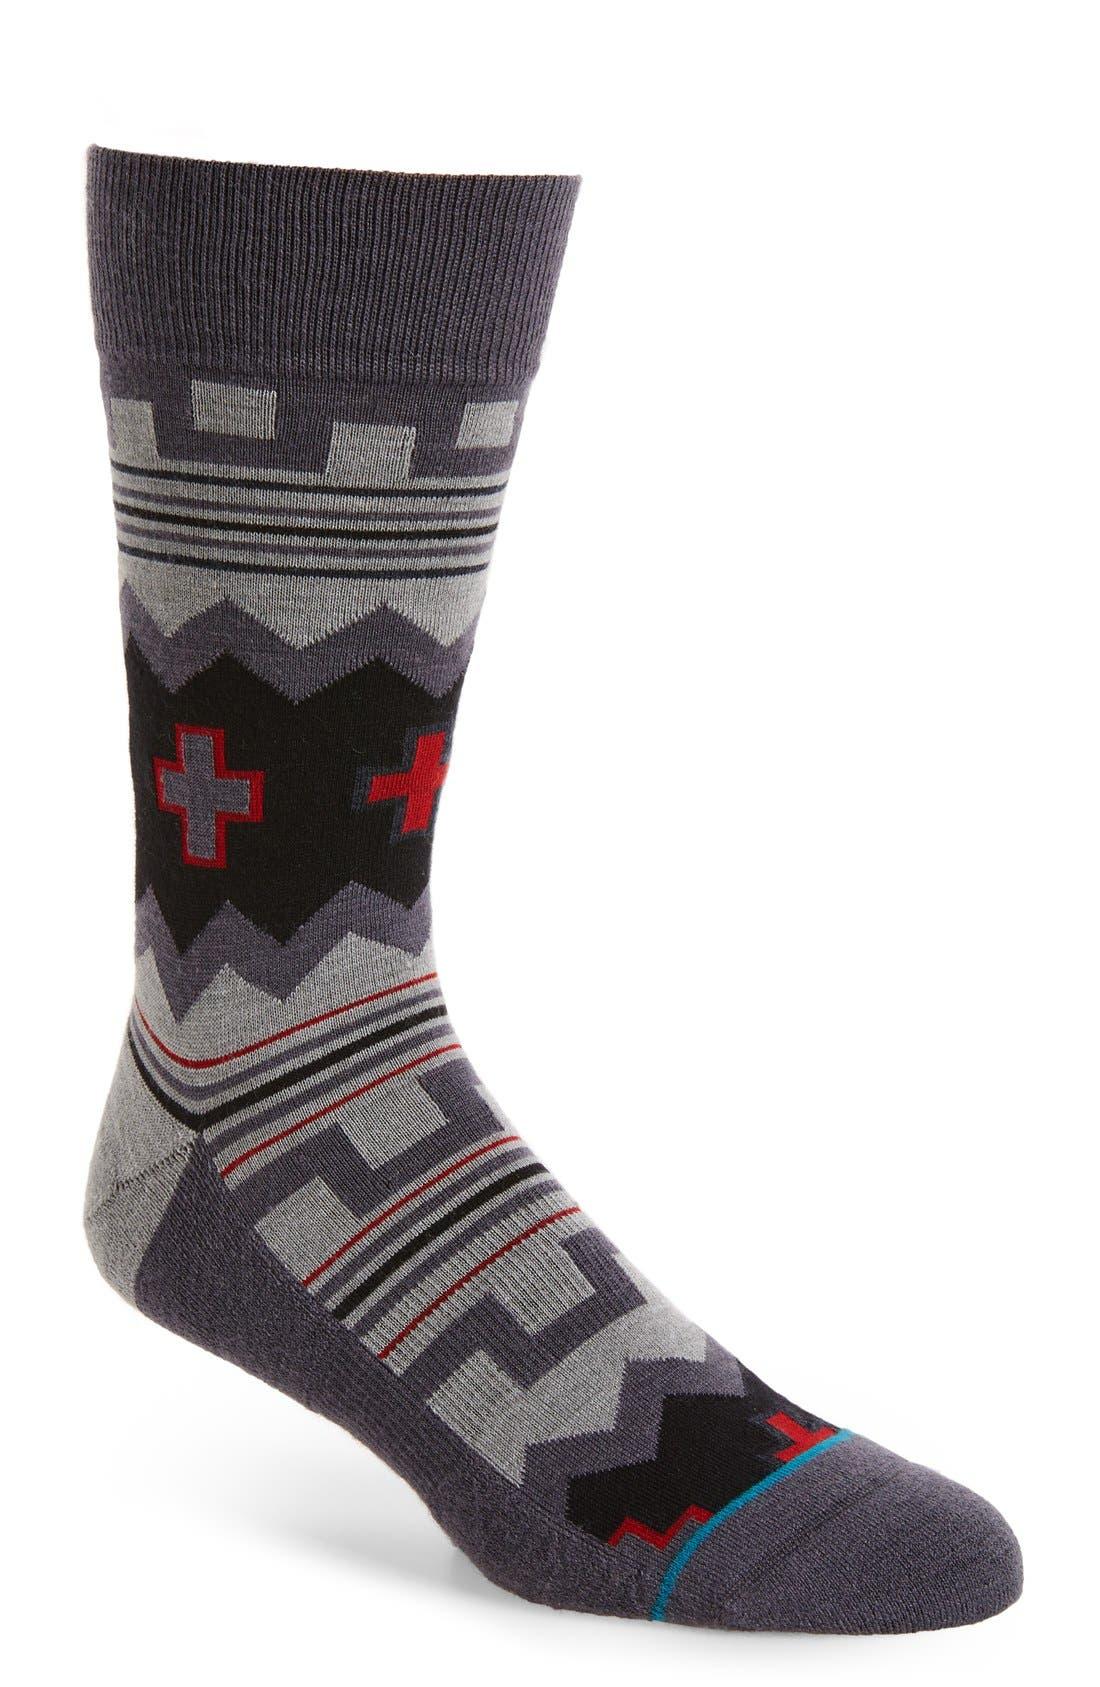 Main Image - Stance Badon Wool Blend Crew Socks